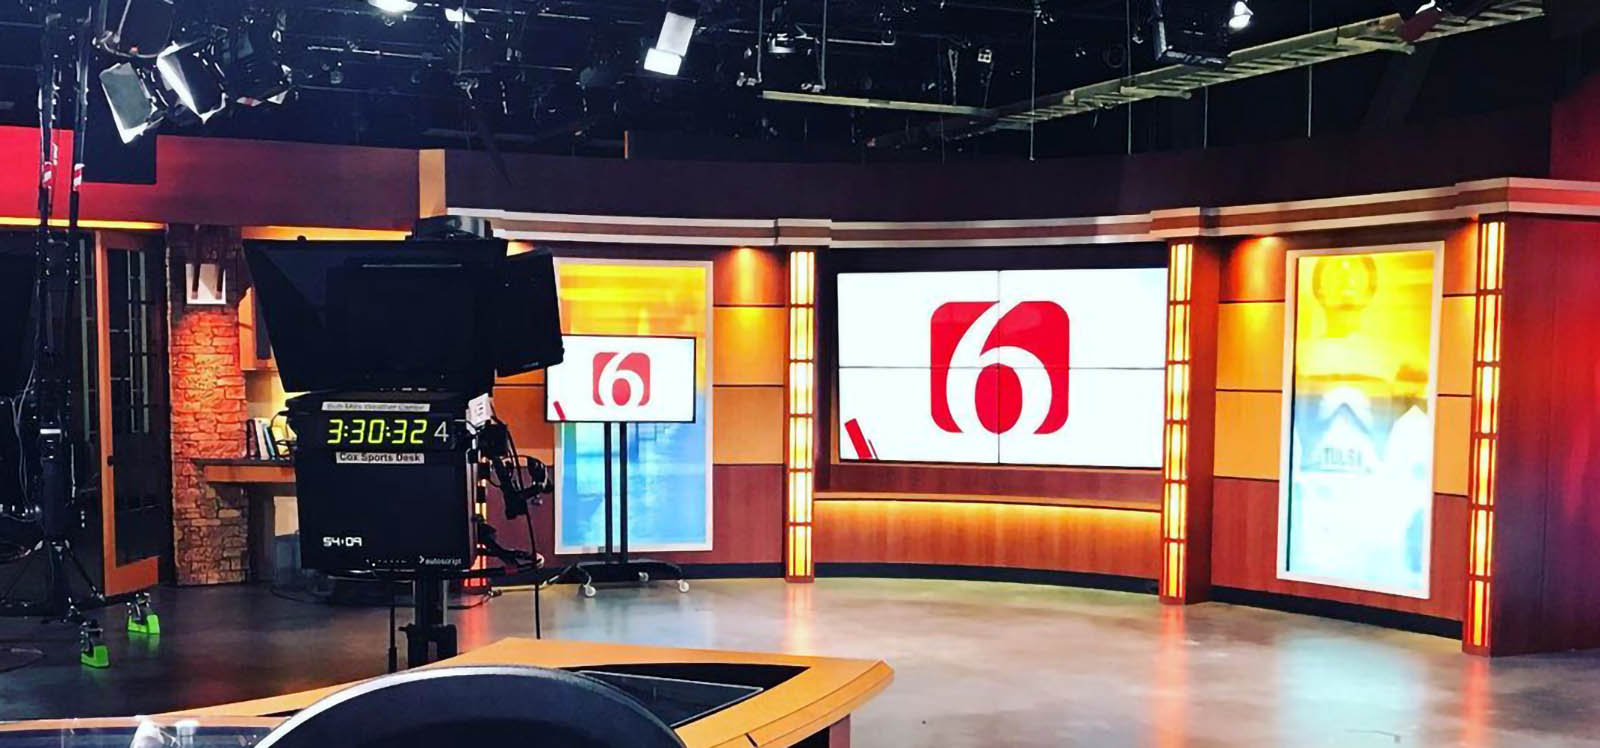 News On 6 Live Coverage Studio